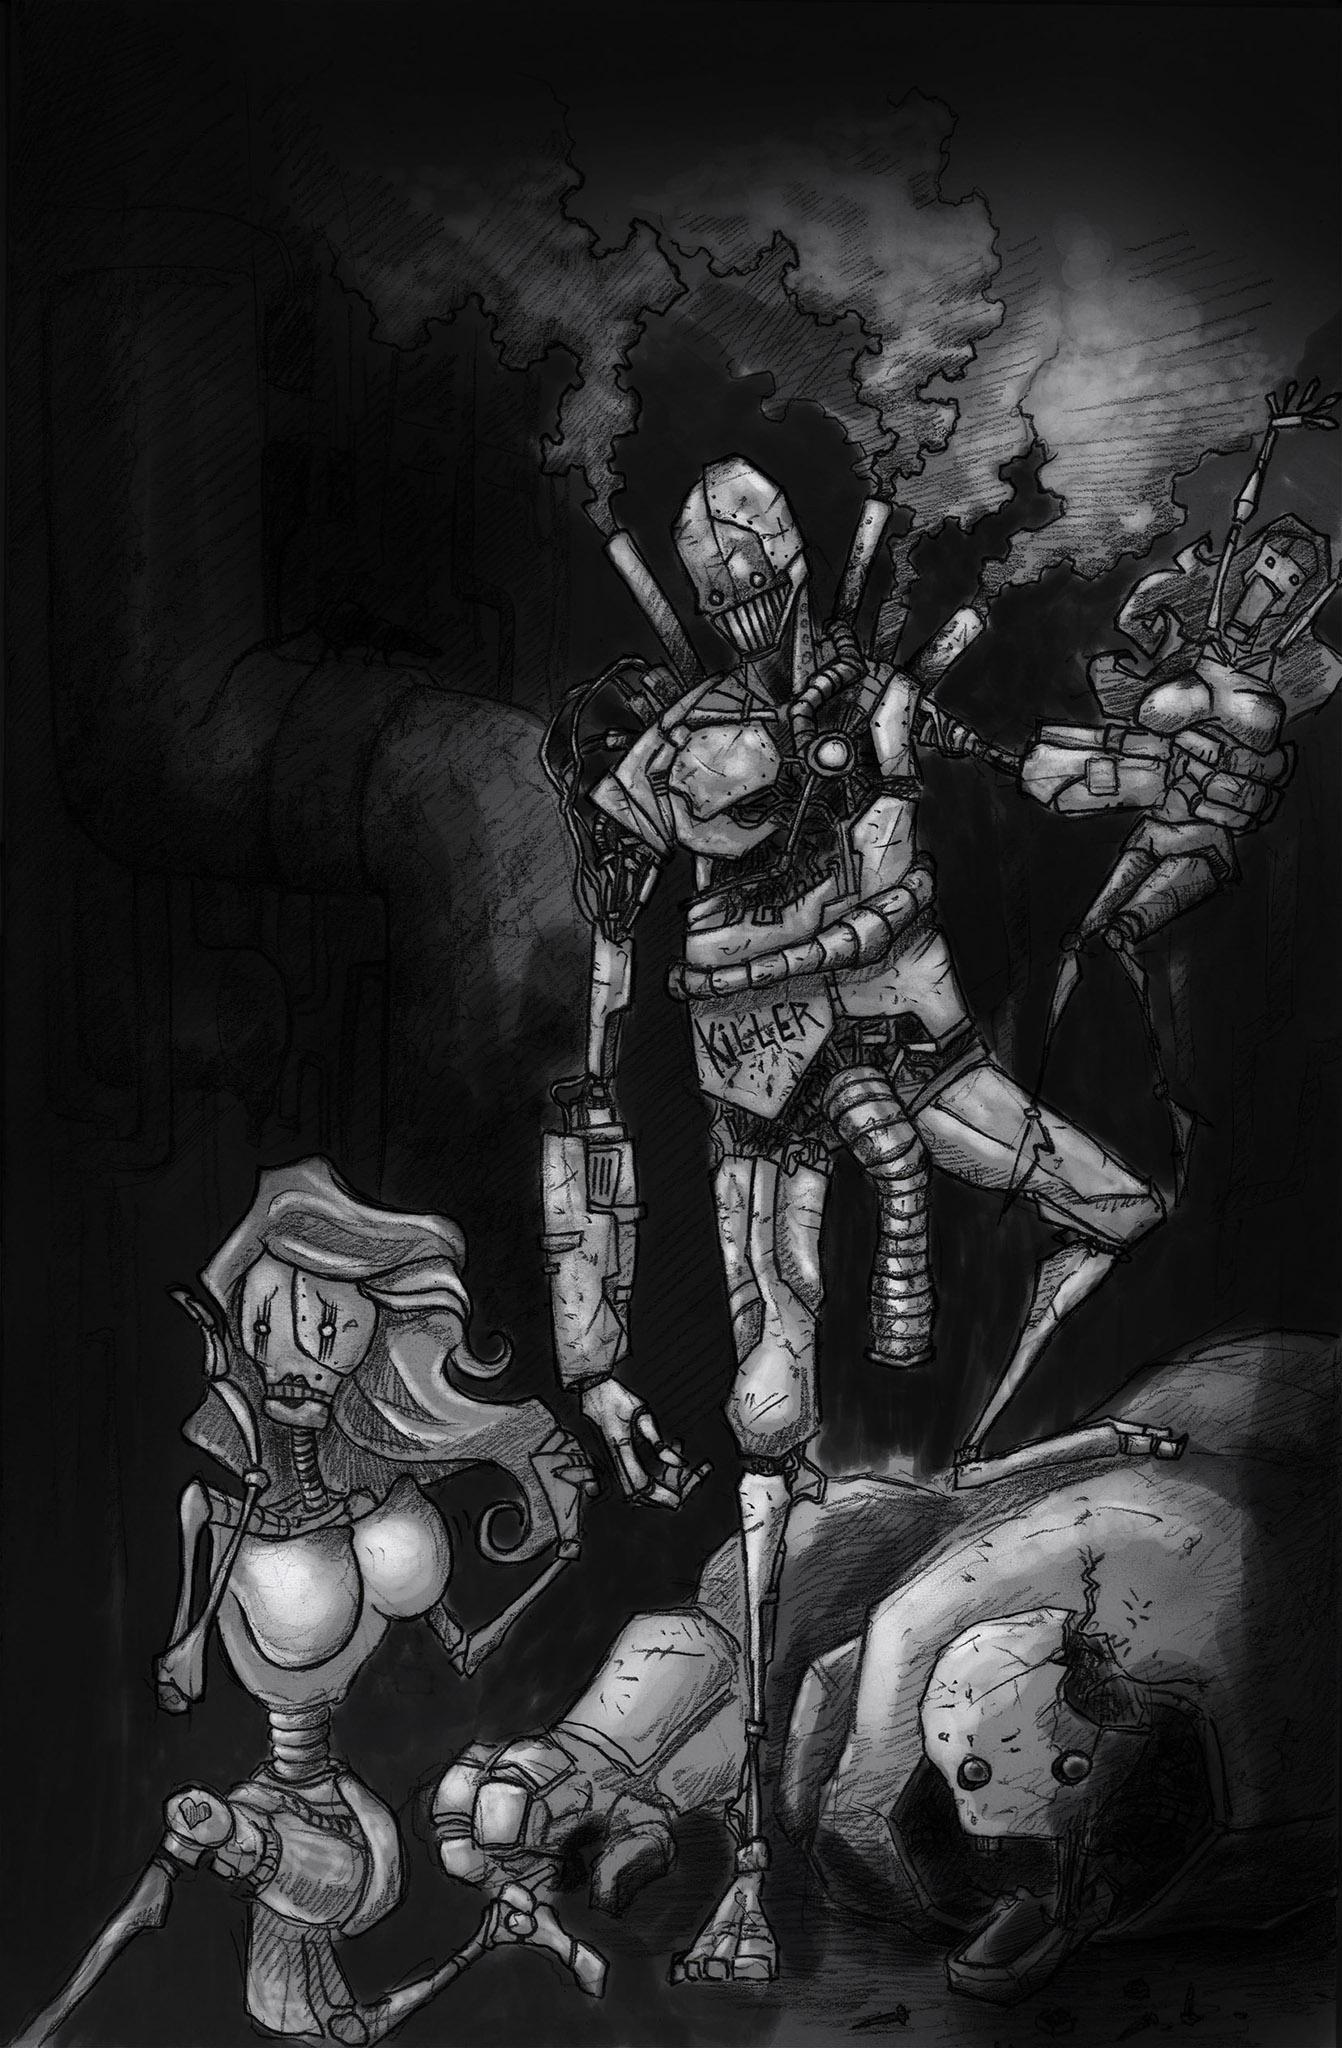 Arthur_Segura_draws_Robots_01